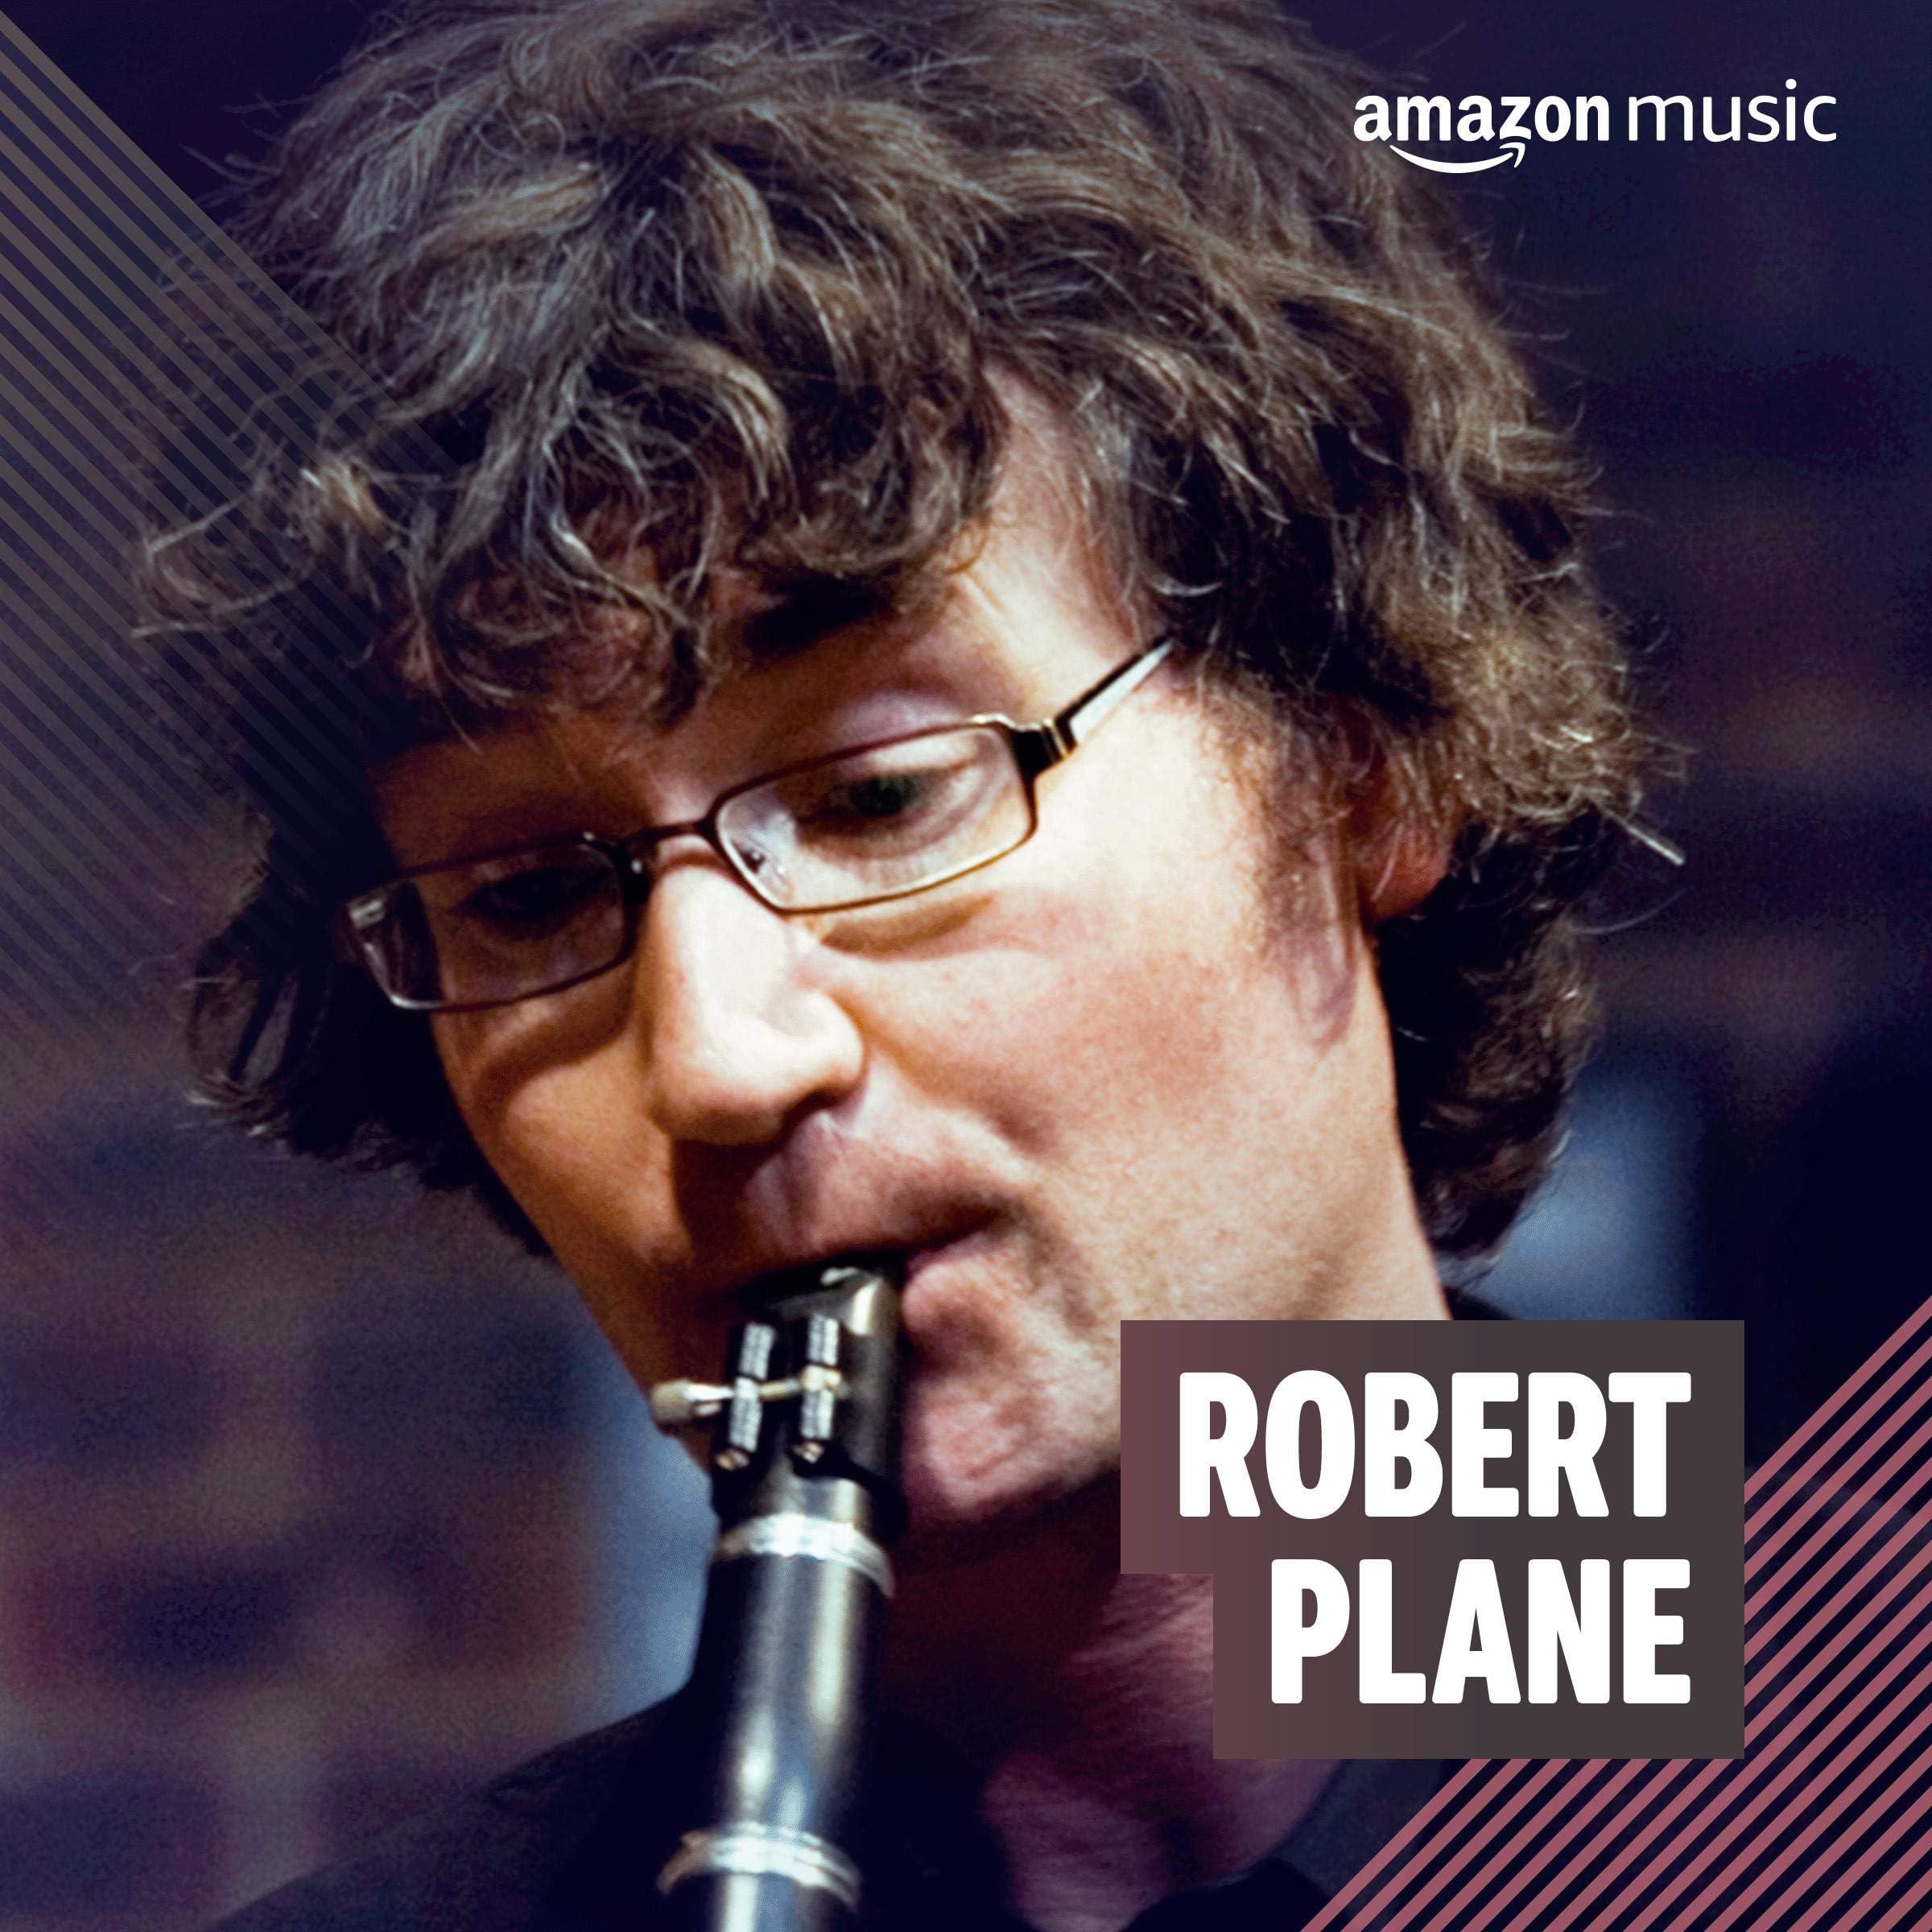 Robert Plane